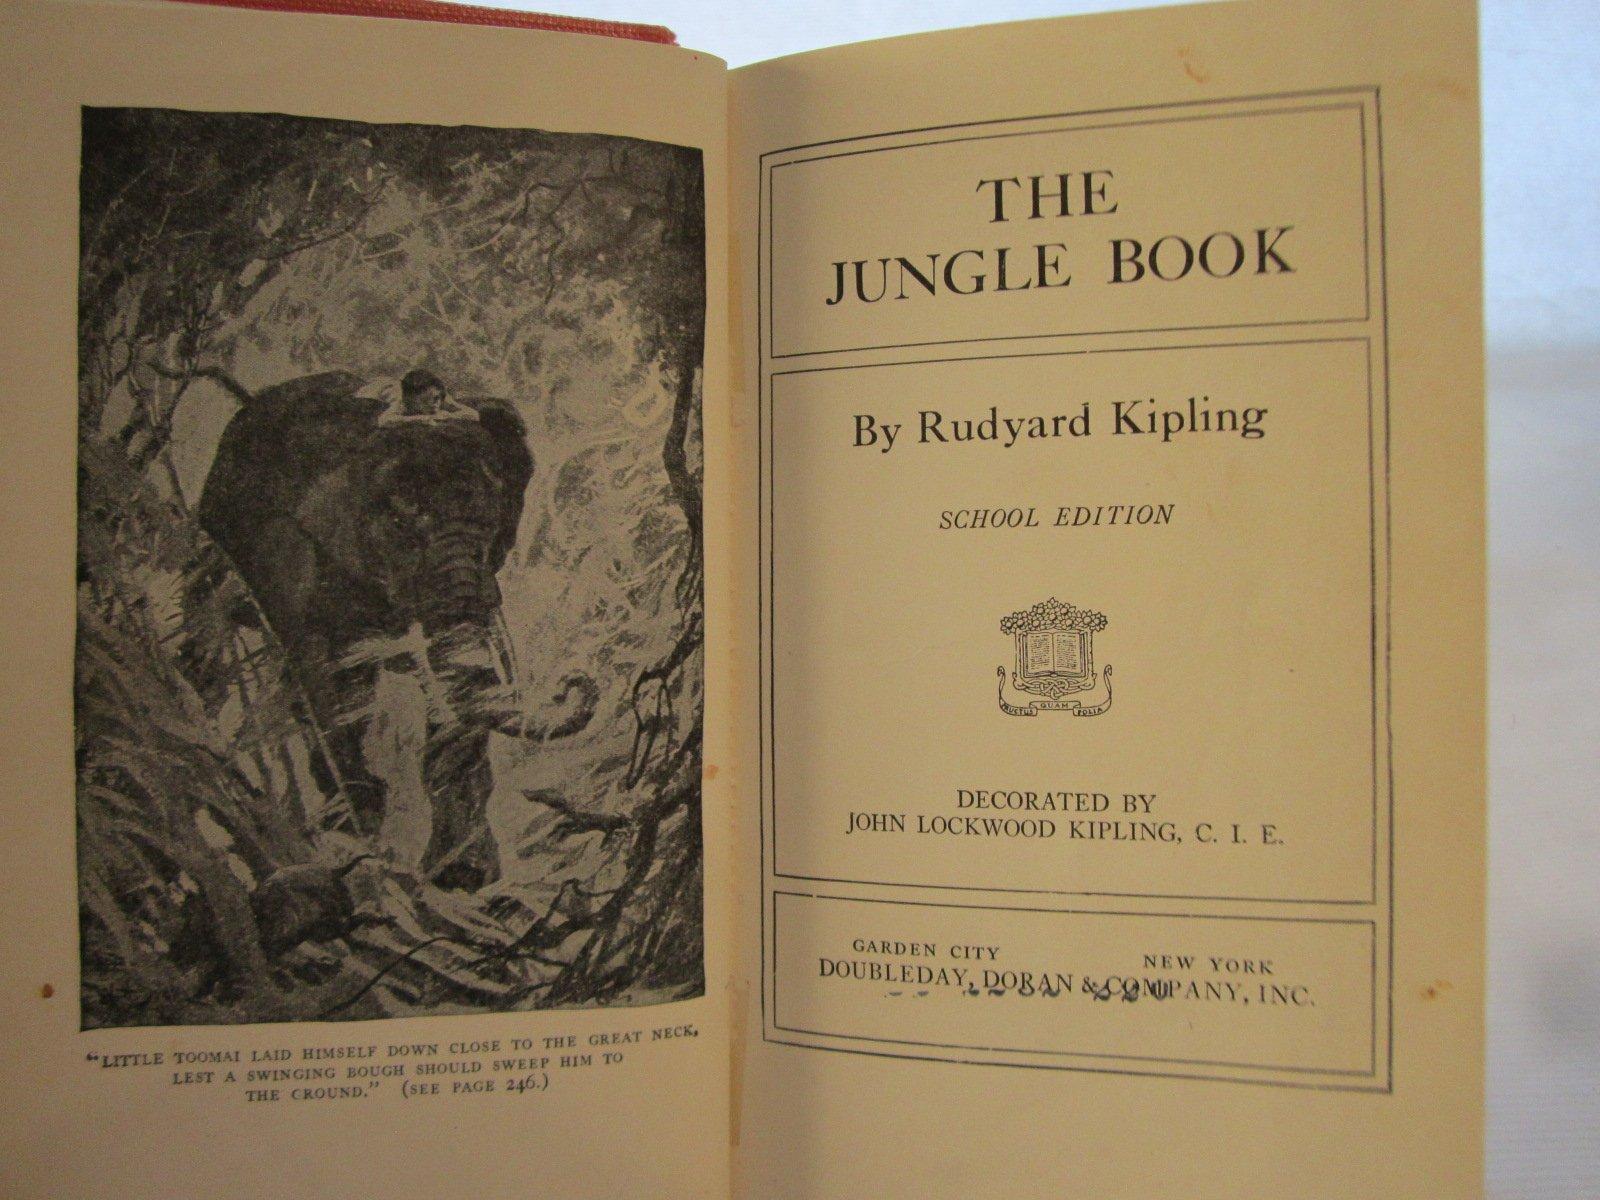 The Jungle Book (School Edition): Rudyard Kipling: Amazon.com: Books